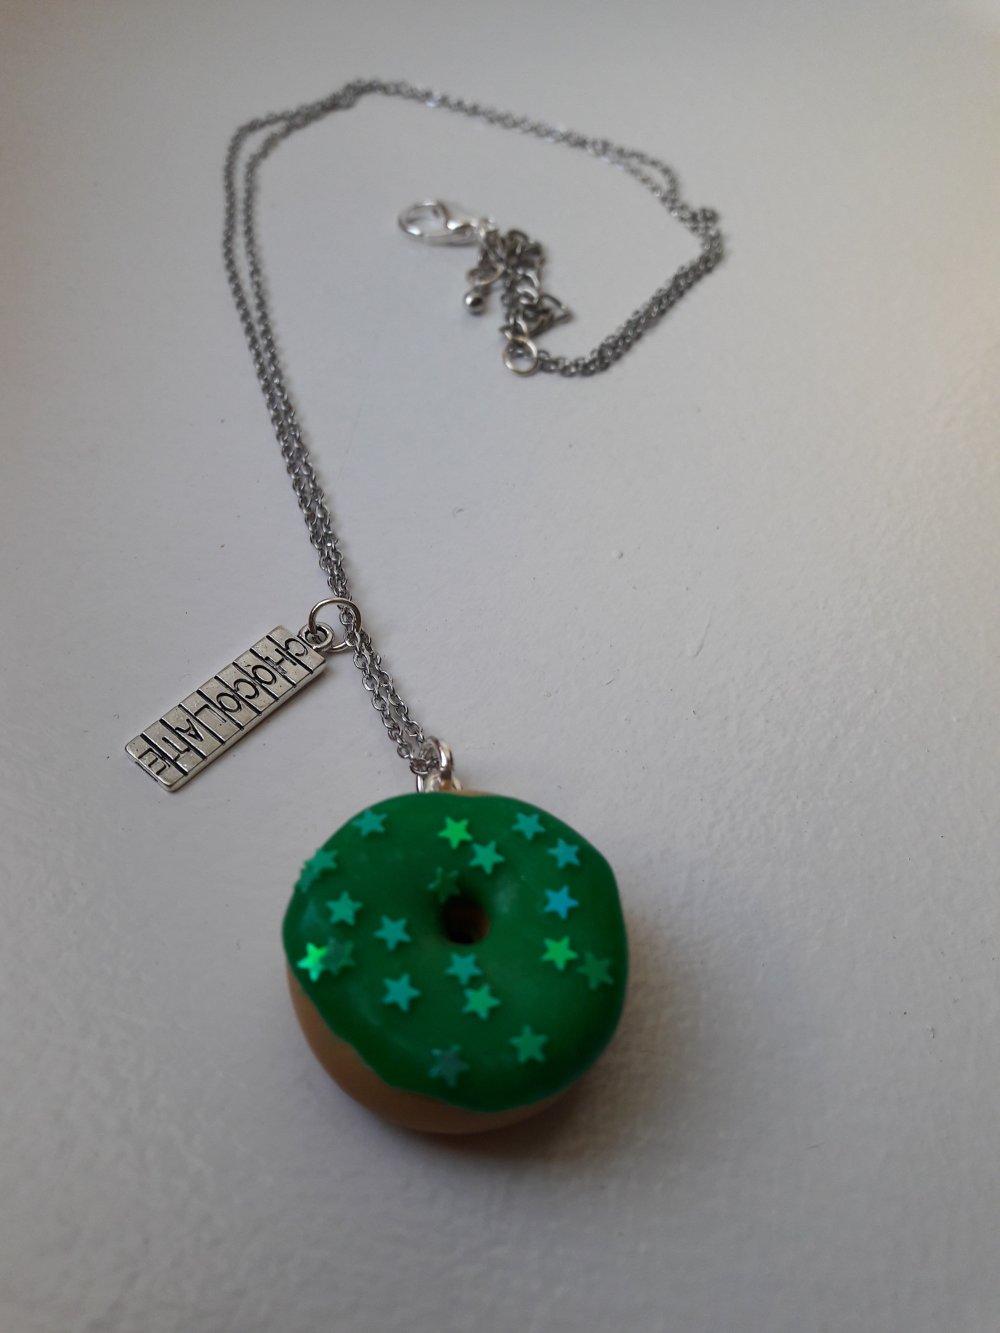 Sautoir Donut vert étoiles